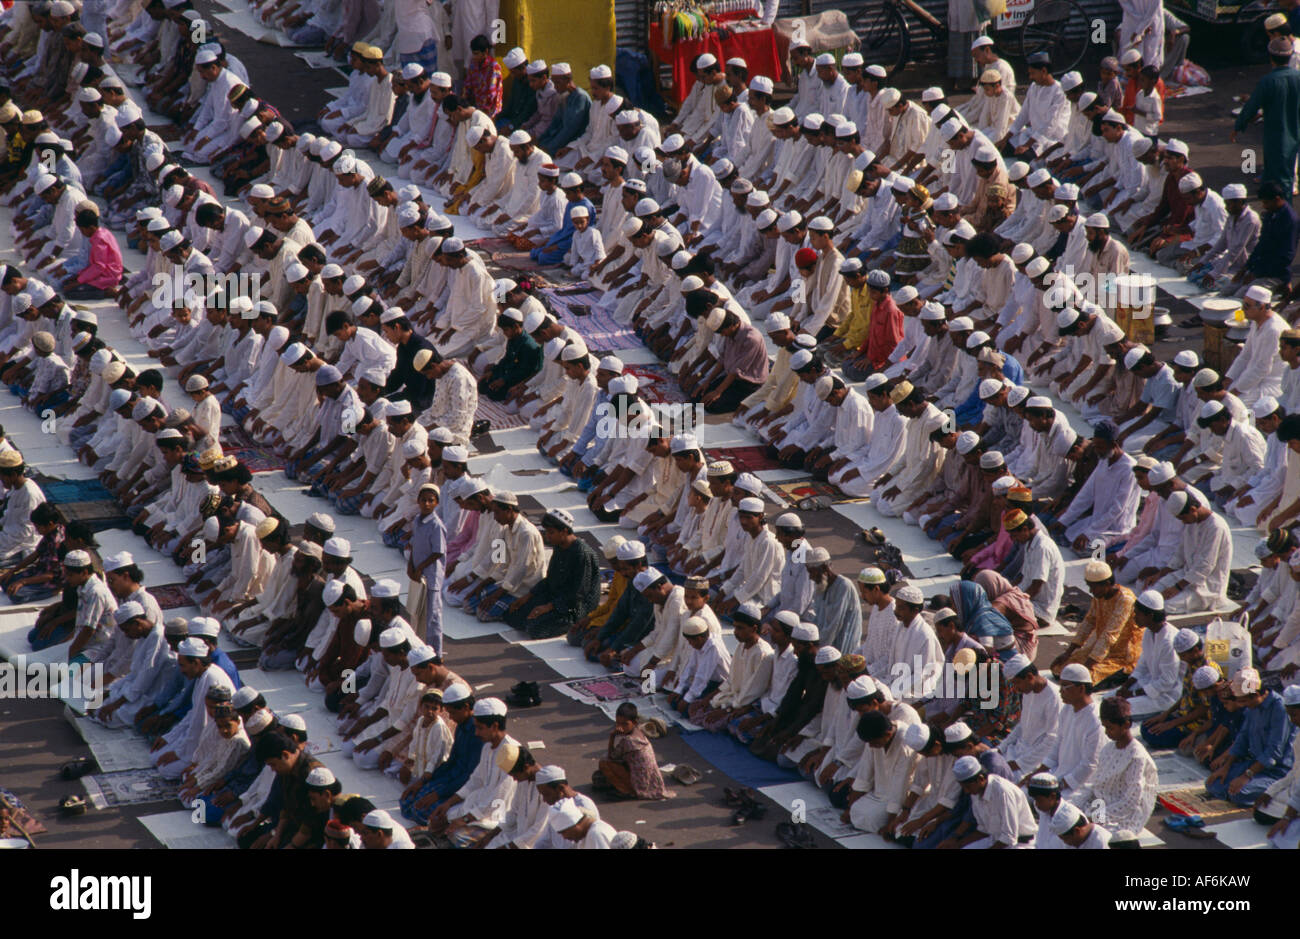 BANGLADESH South Asia Dhaka Religion Islam Rows of Muslims kneeling in prayer - Stock Image